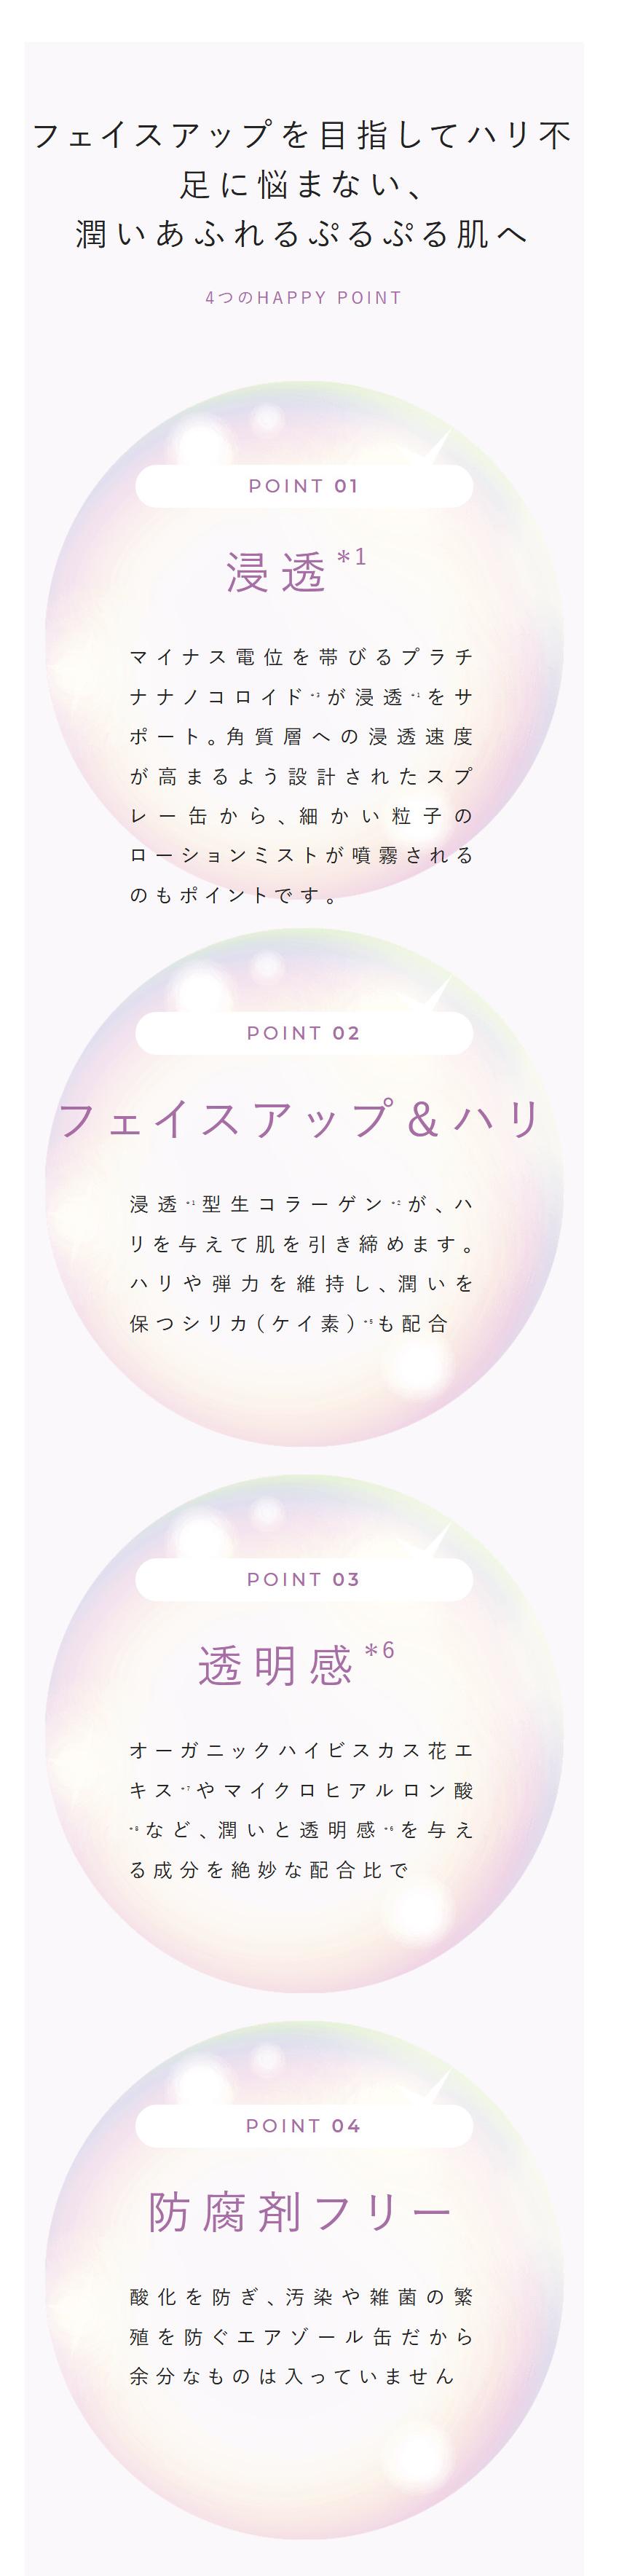 MeeW ミーウ プラチナコラーゲンミスト【高機能ローションミスト】